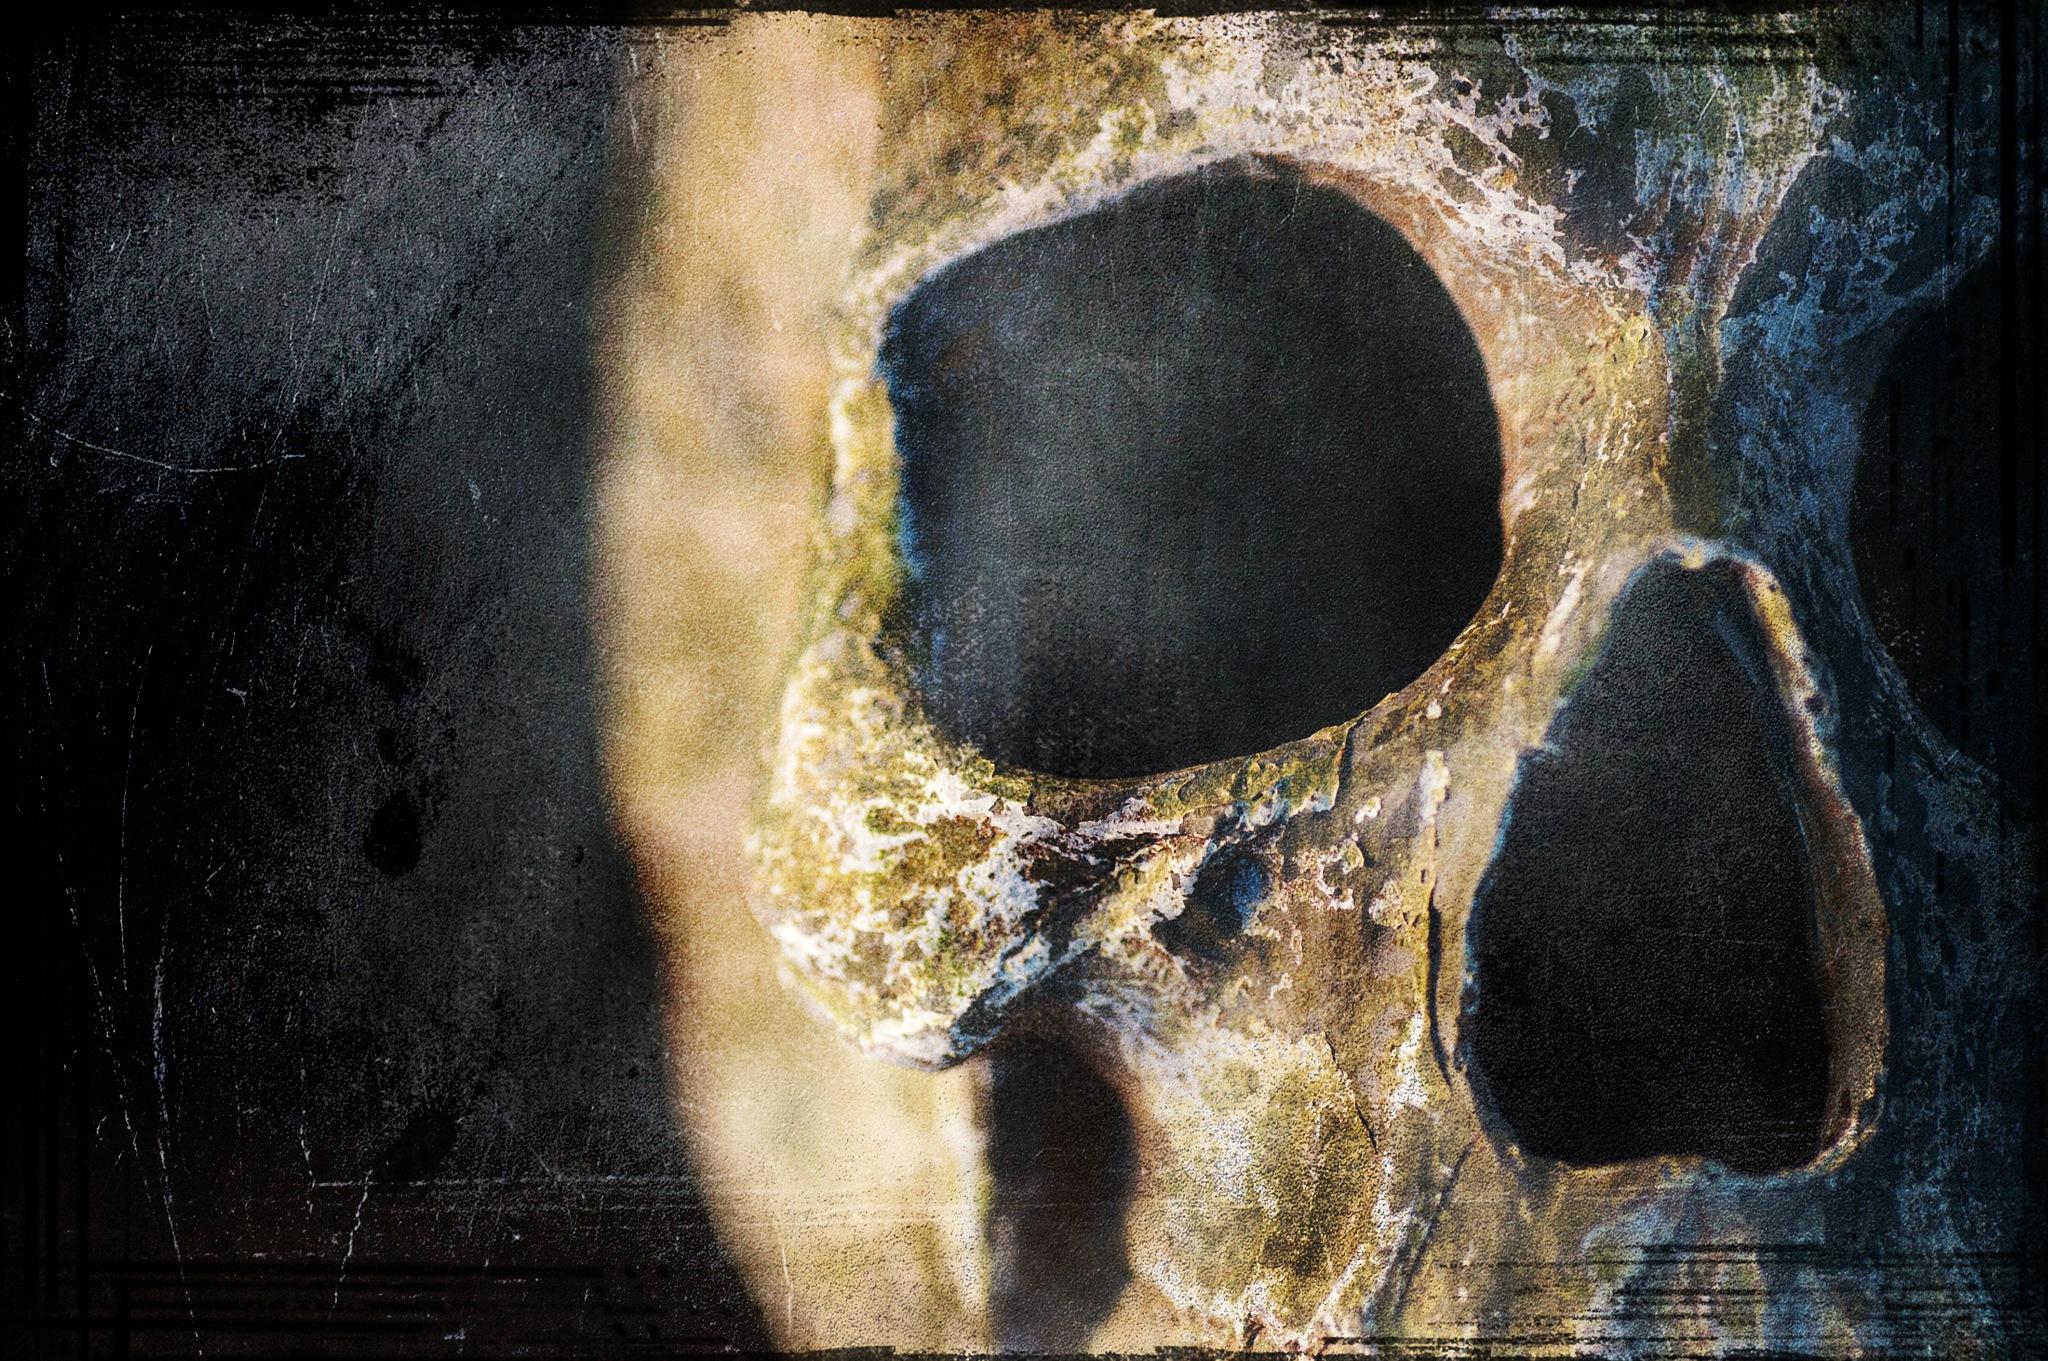 Terrific skull by sylviecorriveau